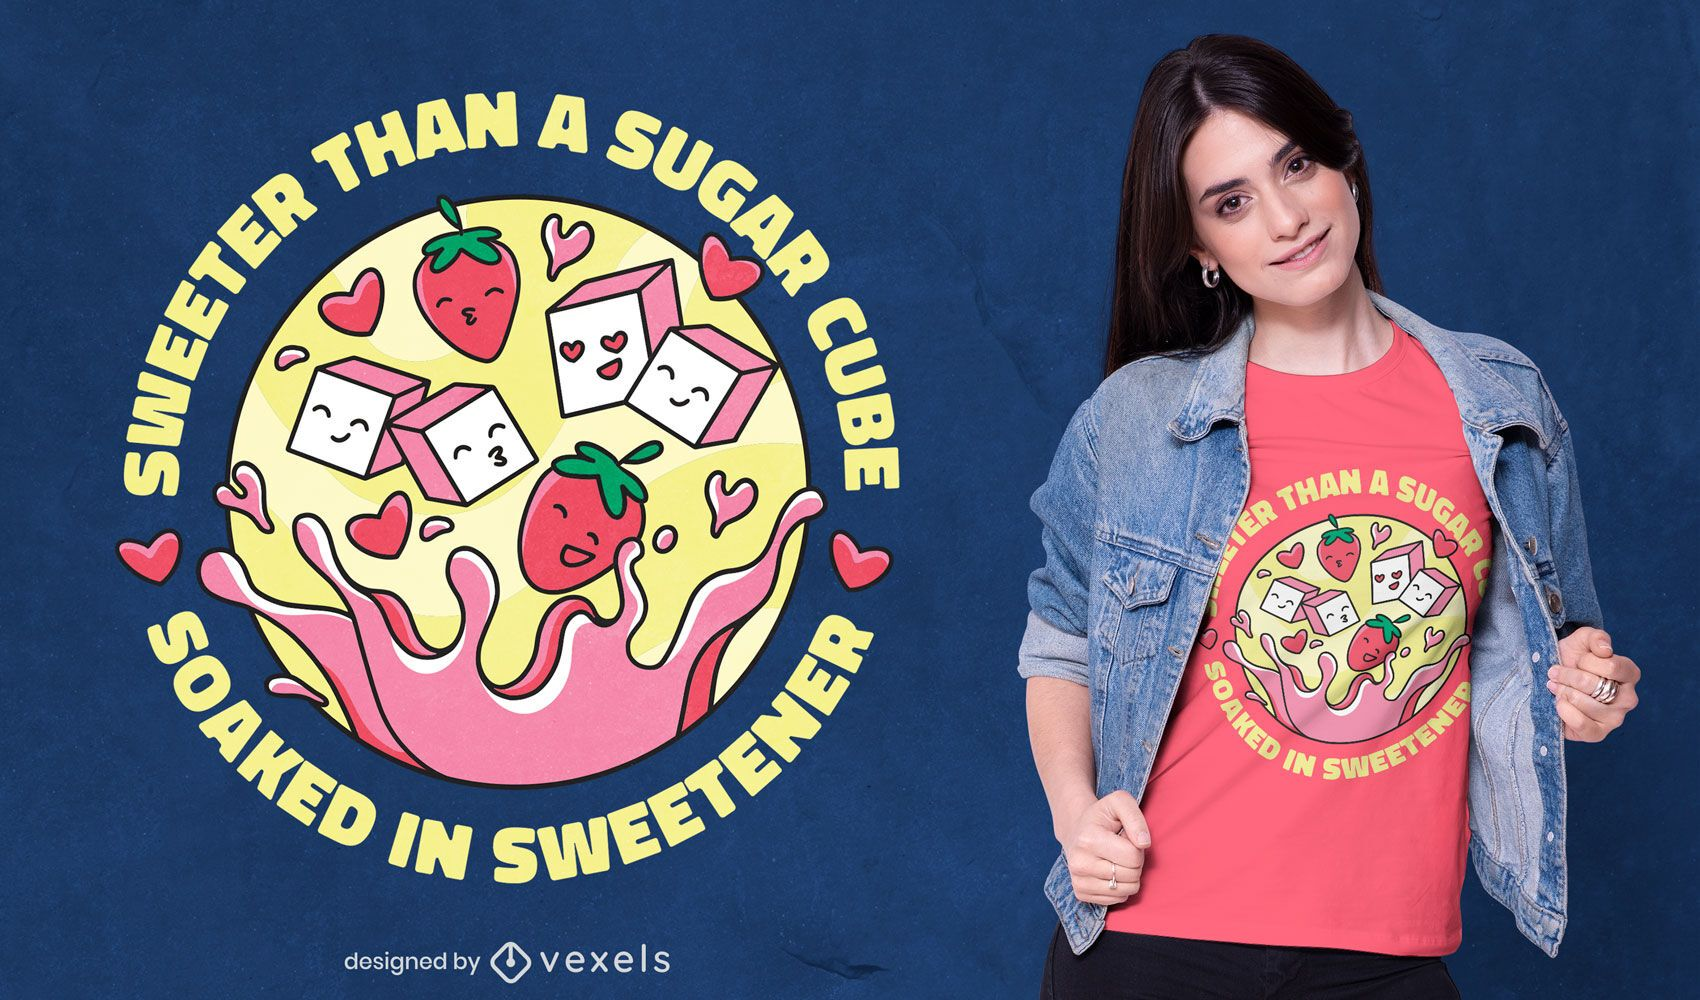 Sweeter than sugar t-shirt design